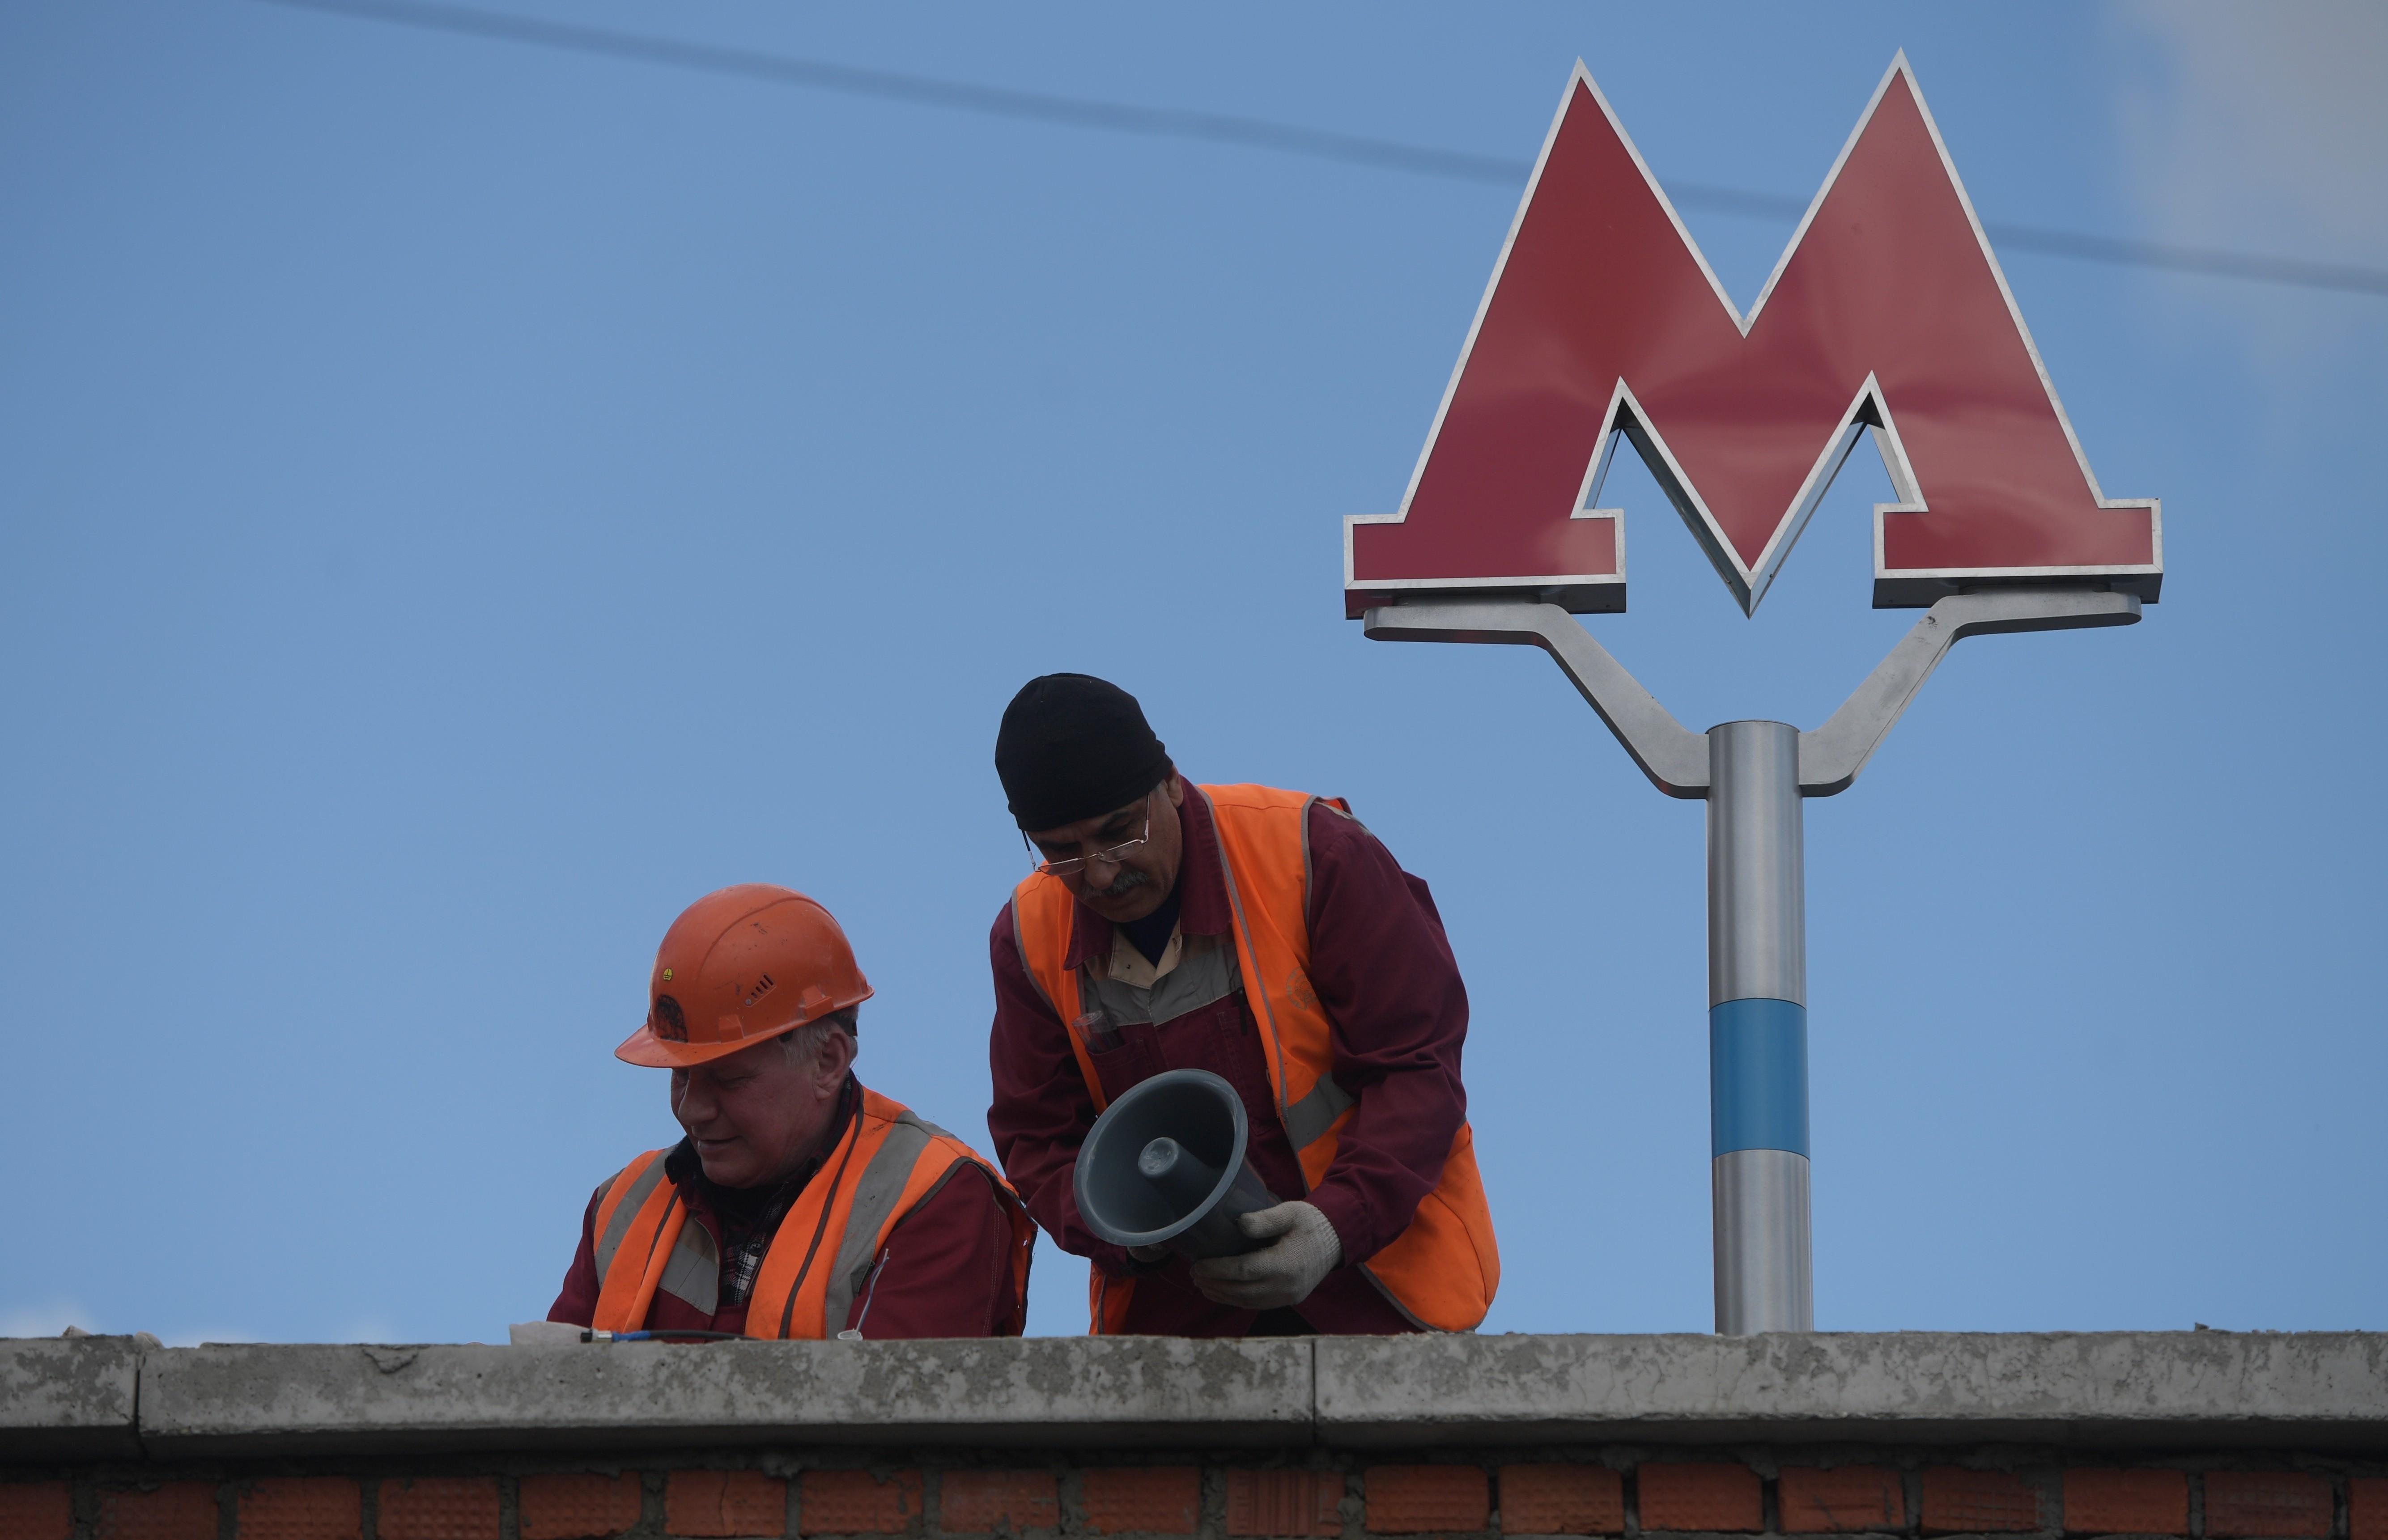 <p>Рабочие у станции метро. Фото: &copy; РИА Новости</p>